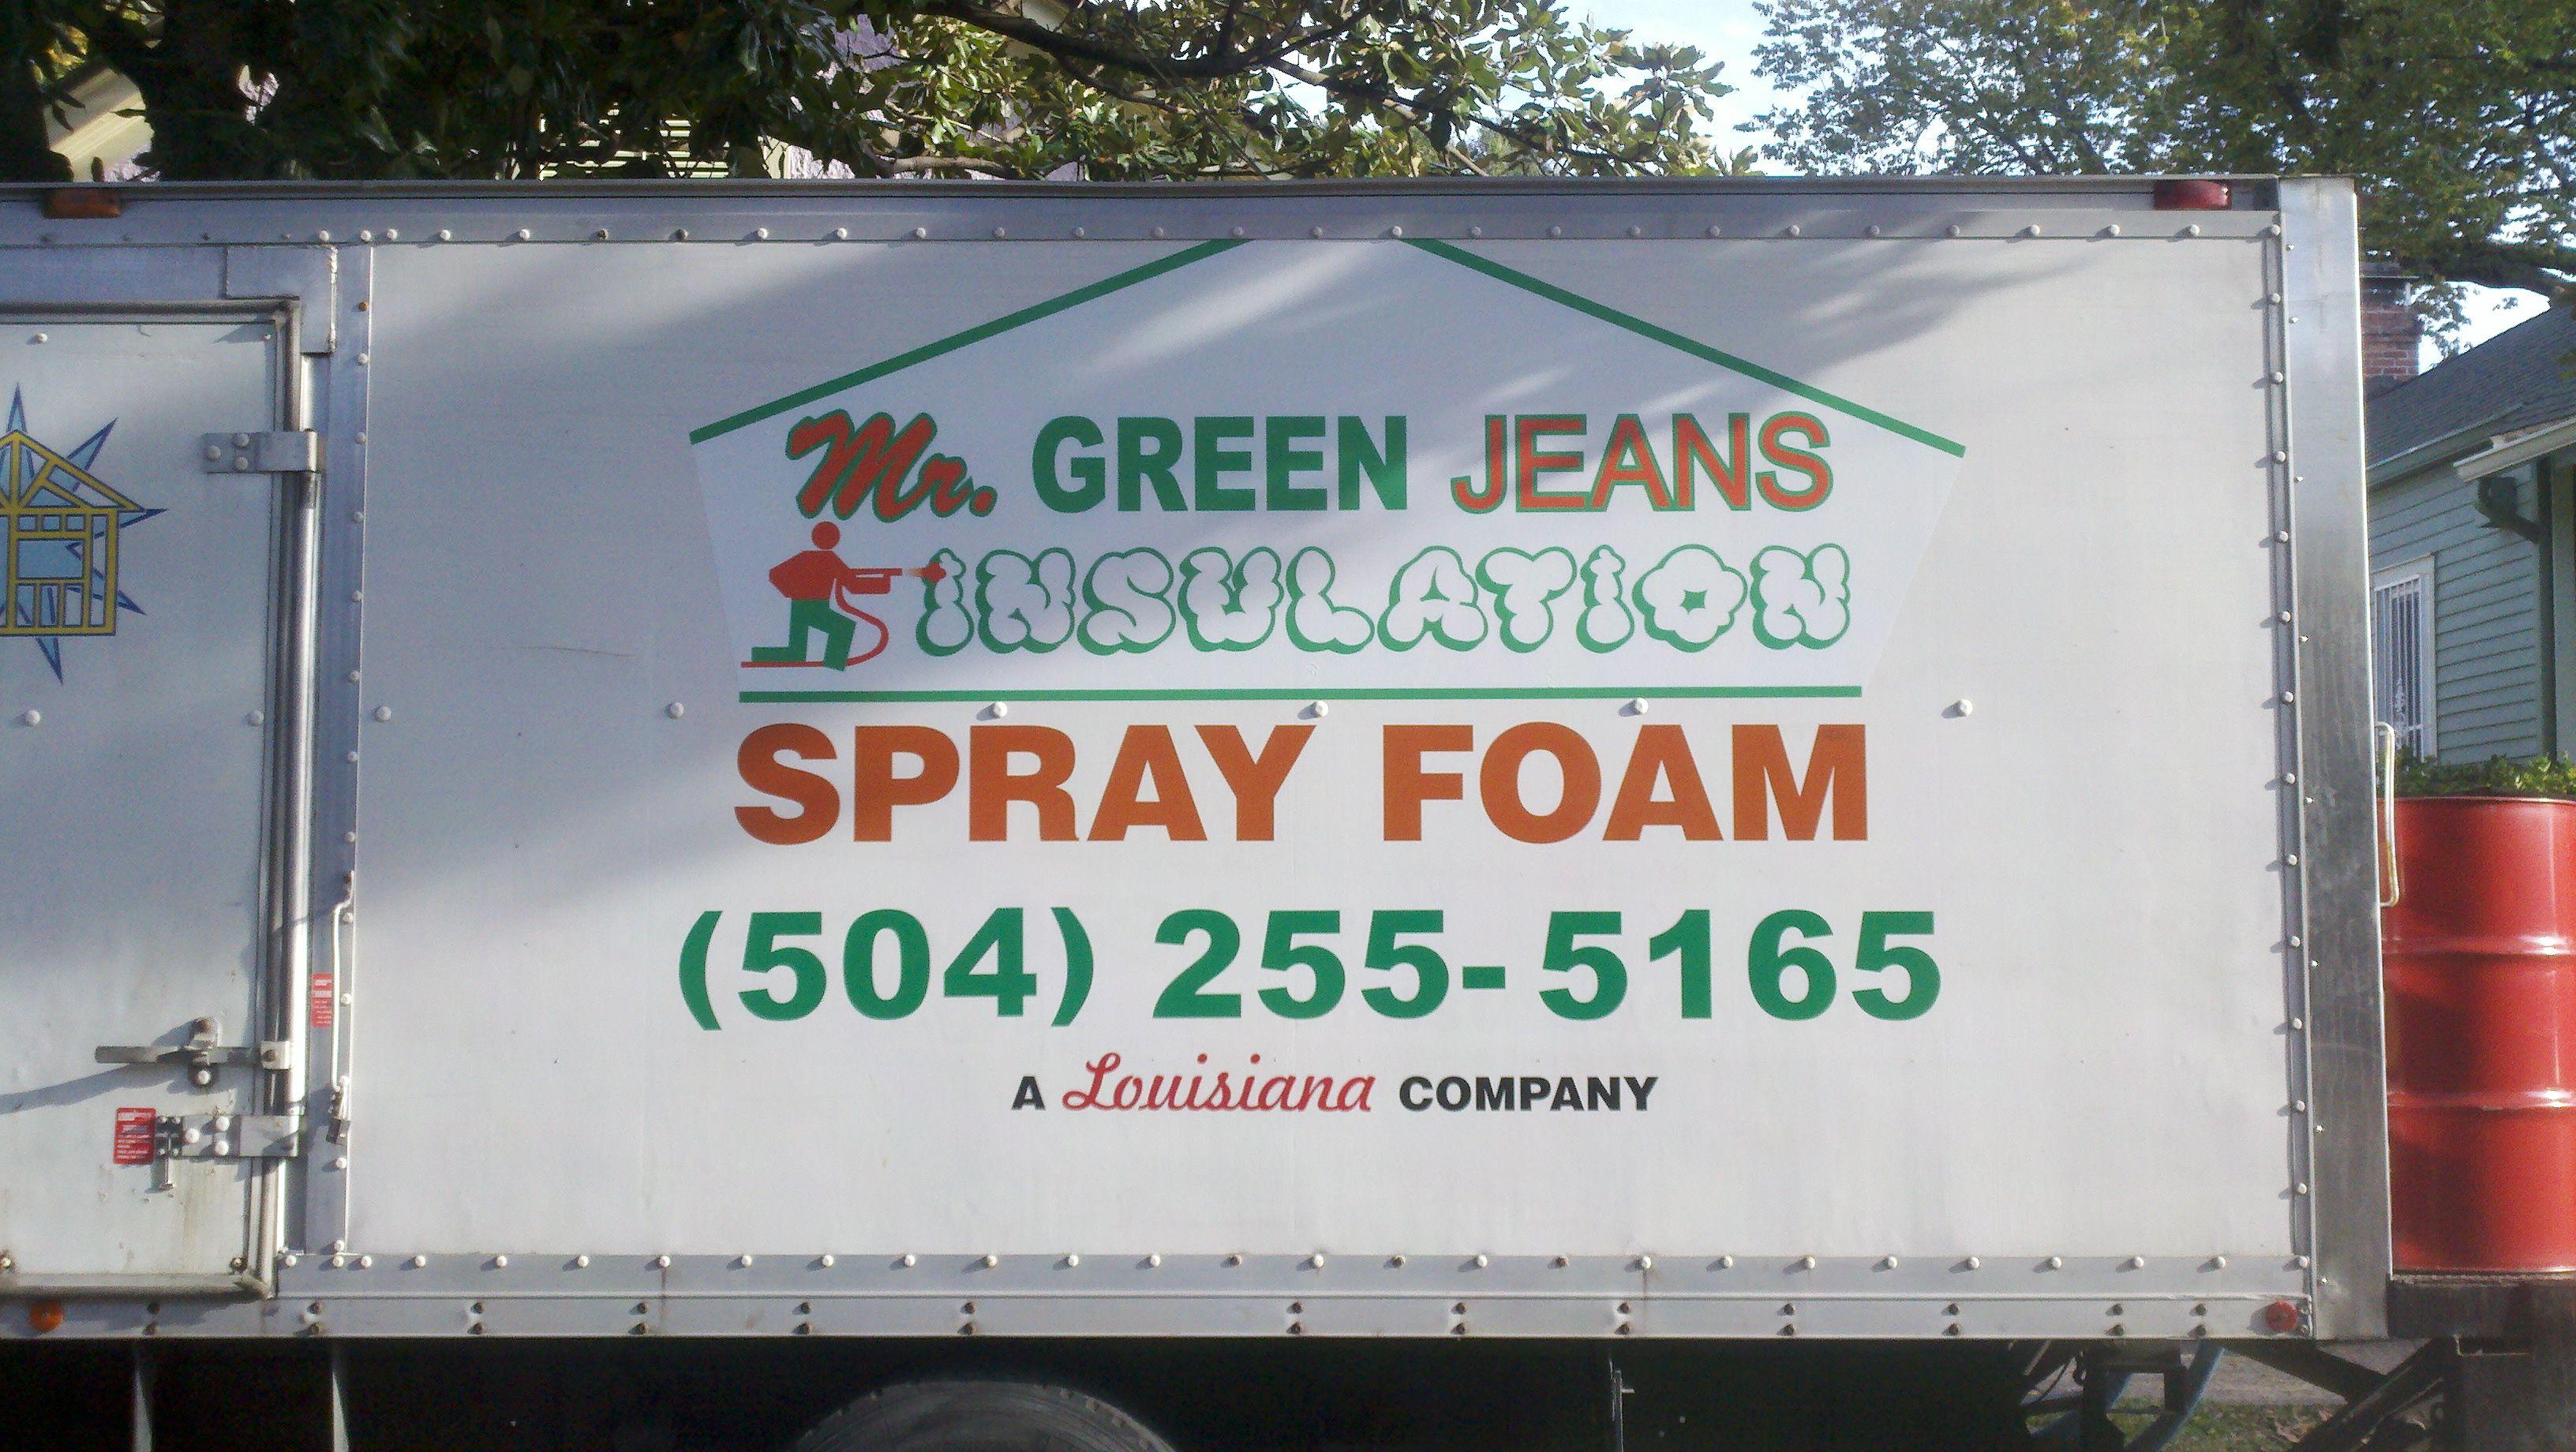 Mr. Green Jeans Insulation Spray Foam rig